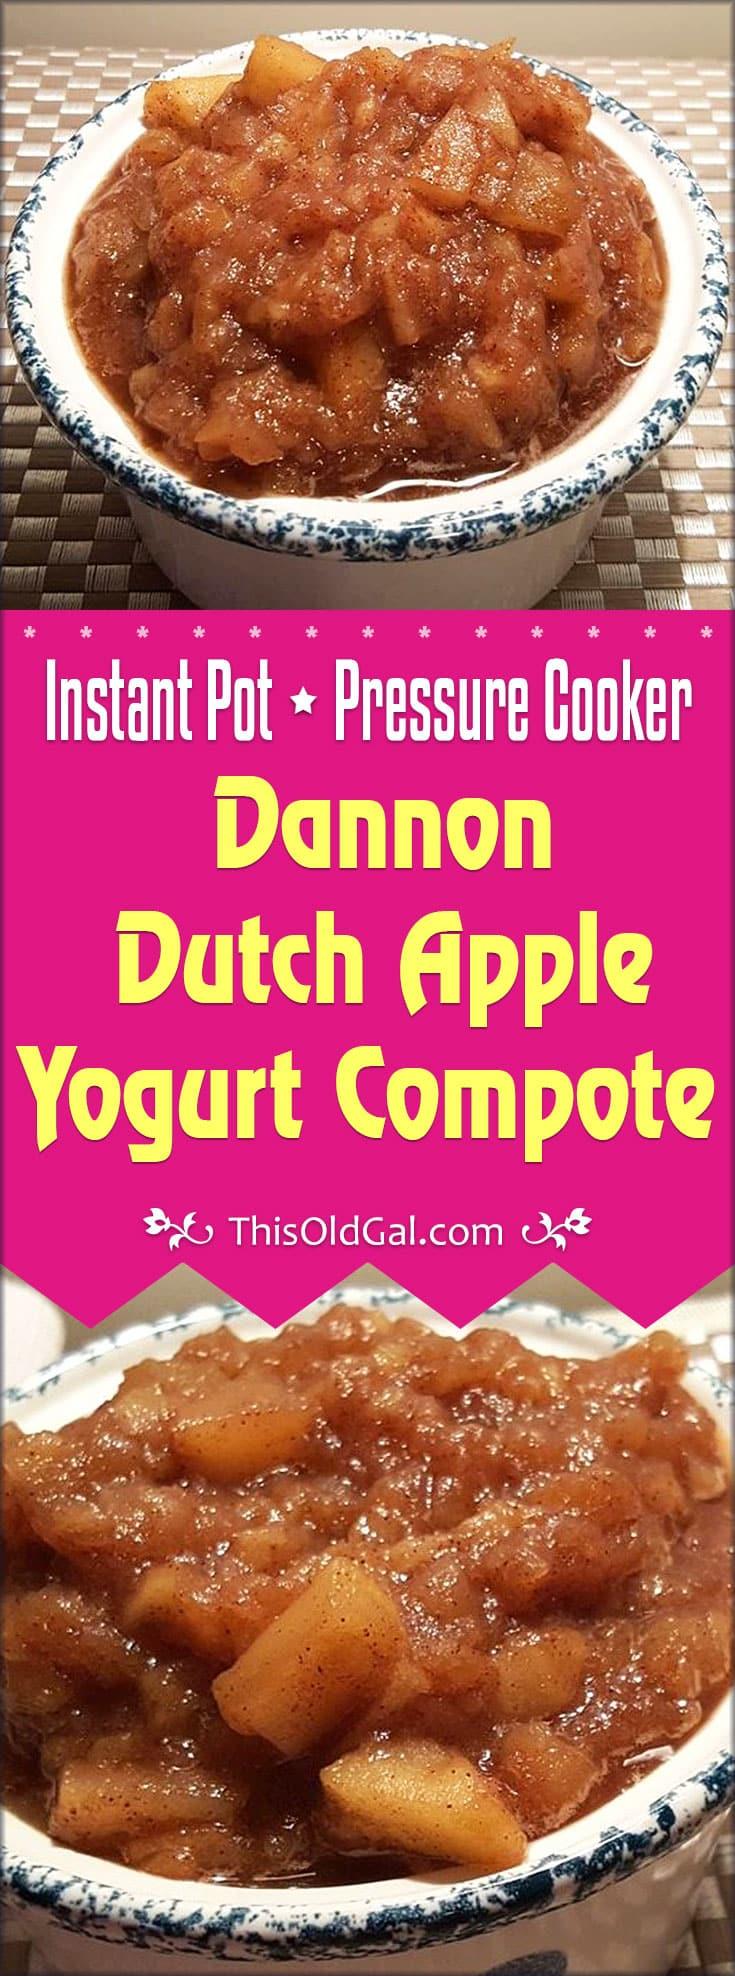 Pressure Cooker Dannon Dutch Apple Yogurt Compote (Instant Pot)